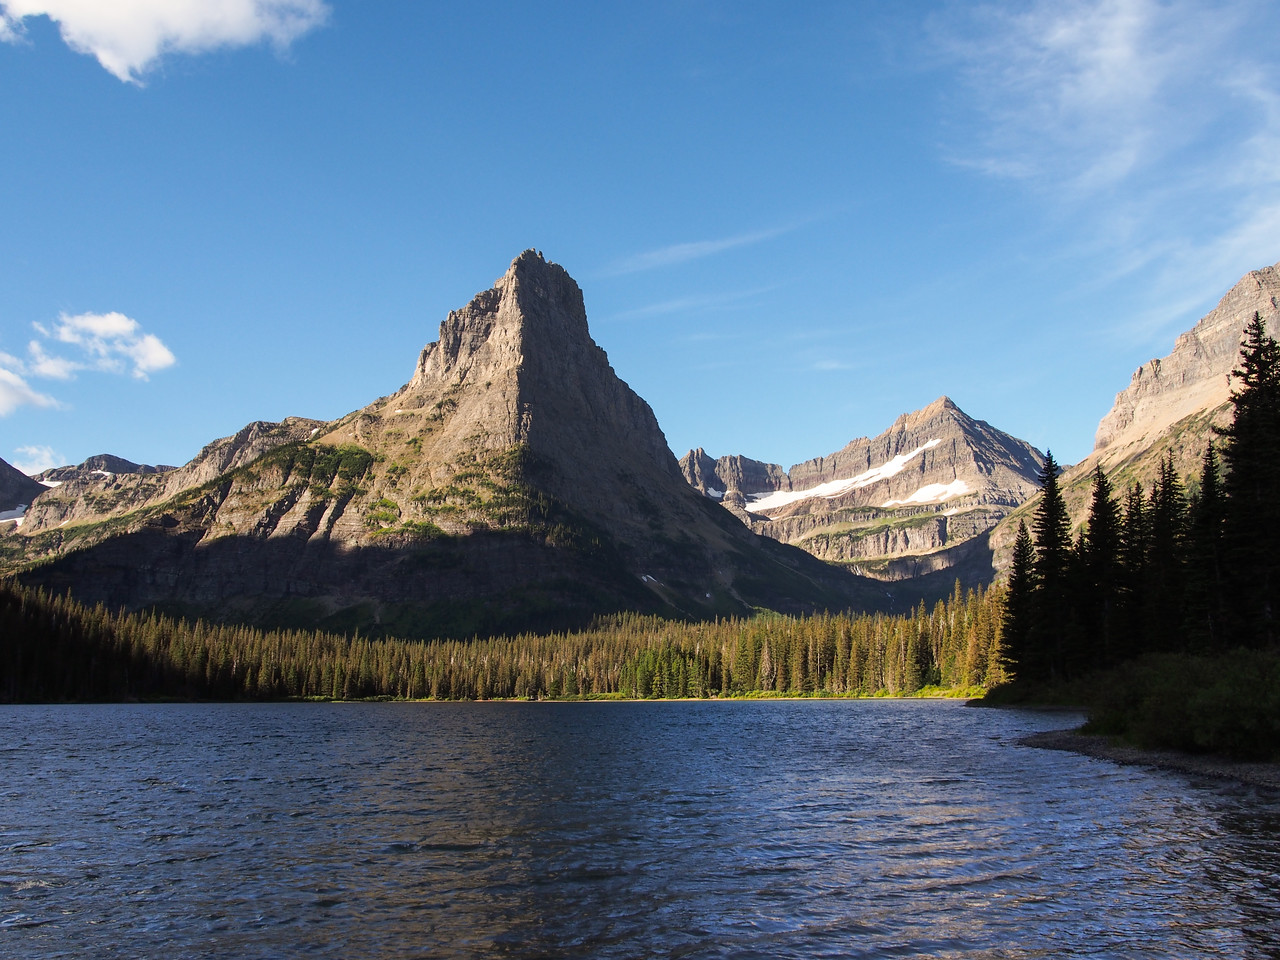 Day 1/5 - View of Glenns Lake from Foot Glenns Lake camp, Glacier NP